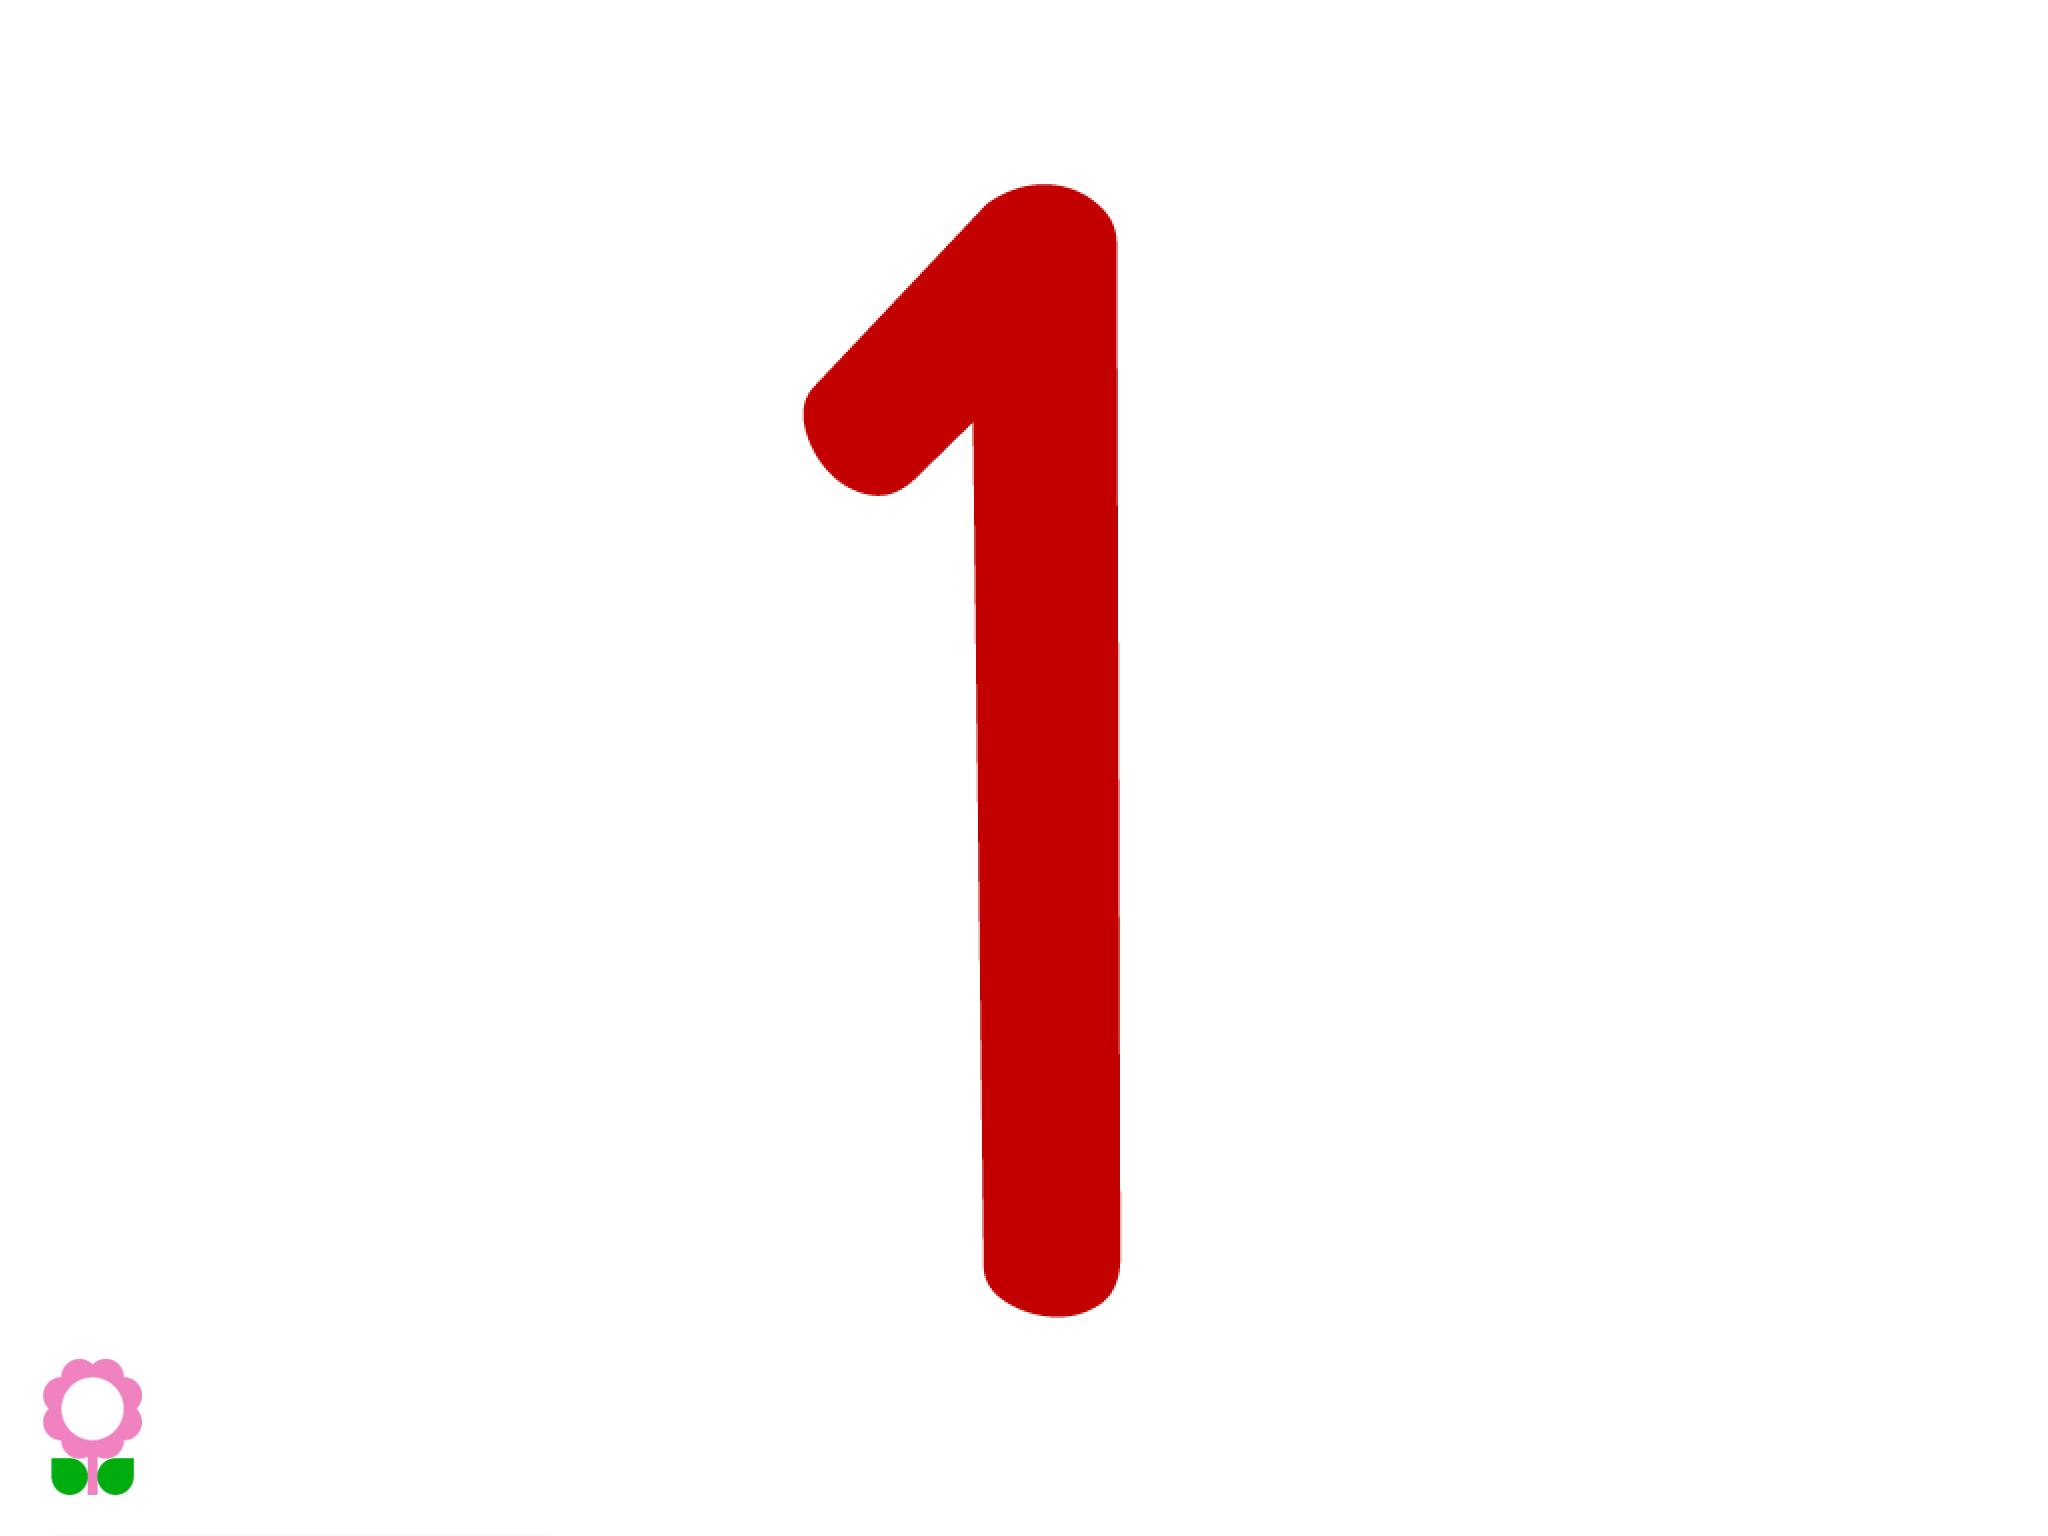 number games